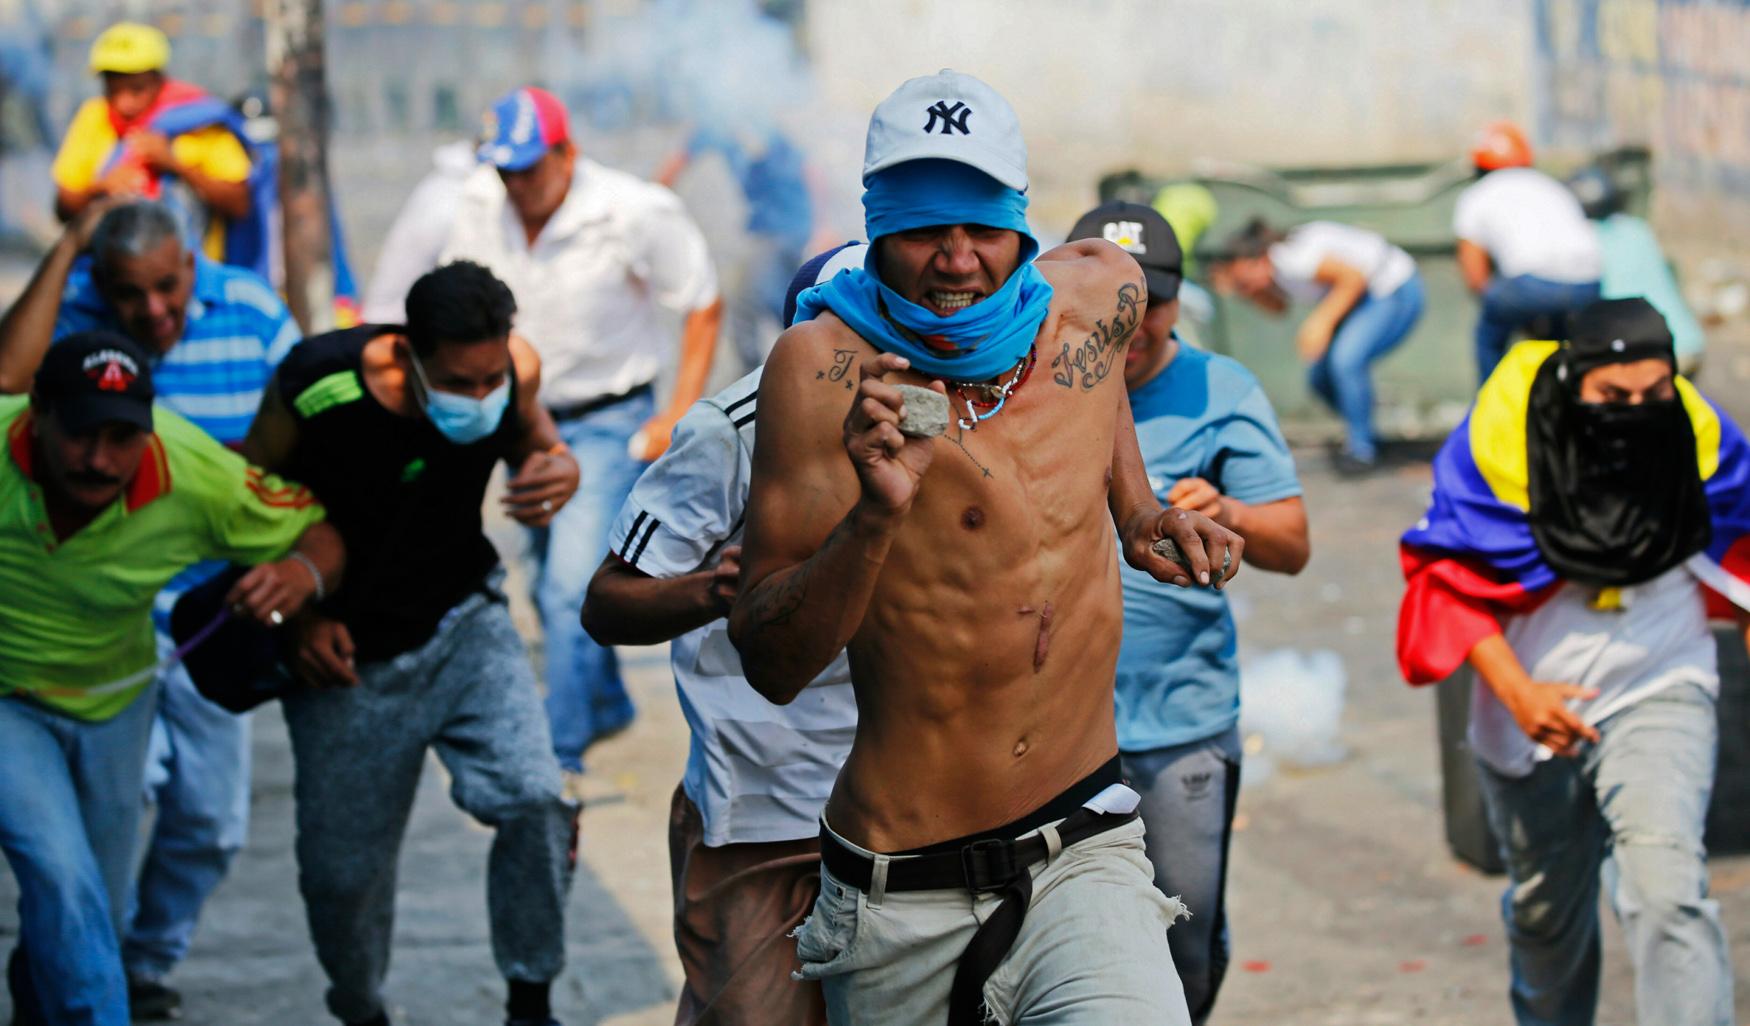 Demonstrators run from tear gas fired by Venezuelan Bolivarian National Guards in Urena, Venezuela, near the border with Colombia, Saturday, Feb. 23, 2019.  (AP Photo/Fernando Llano)